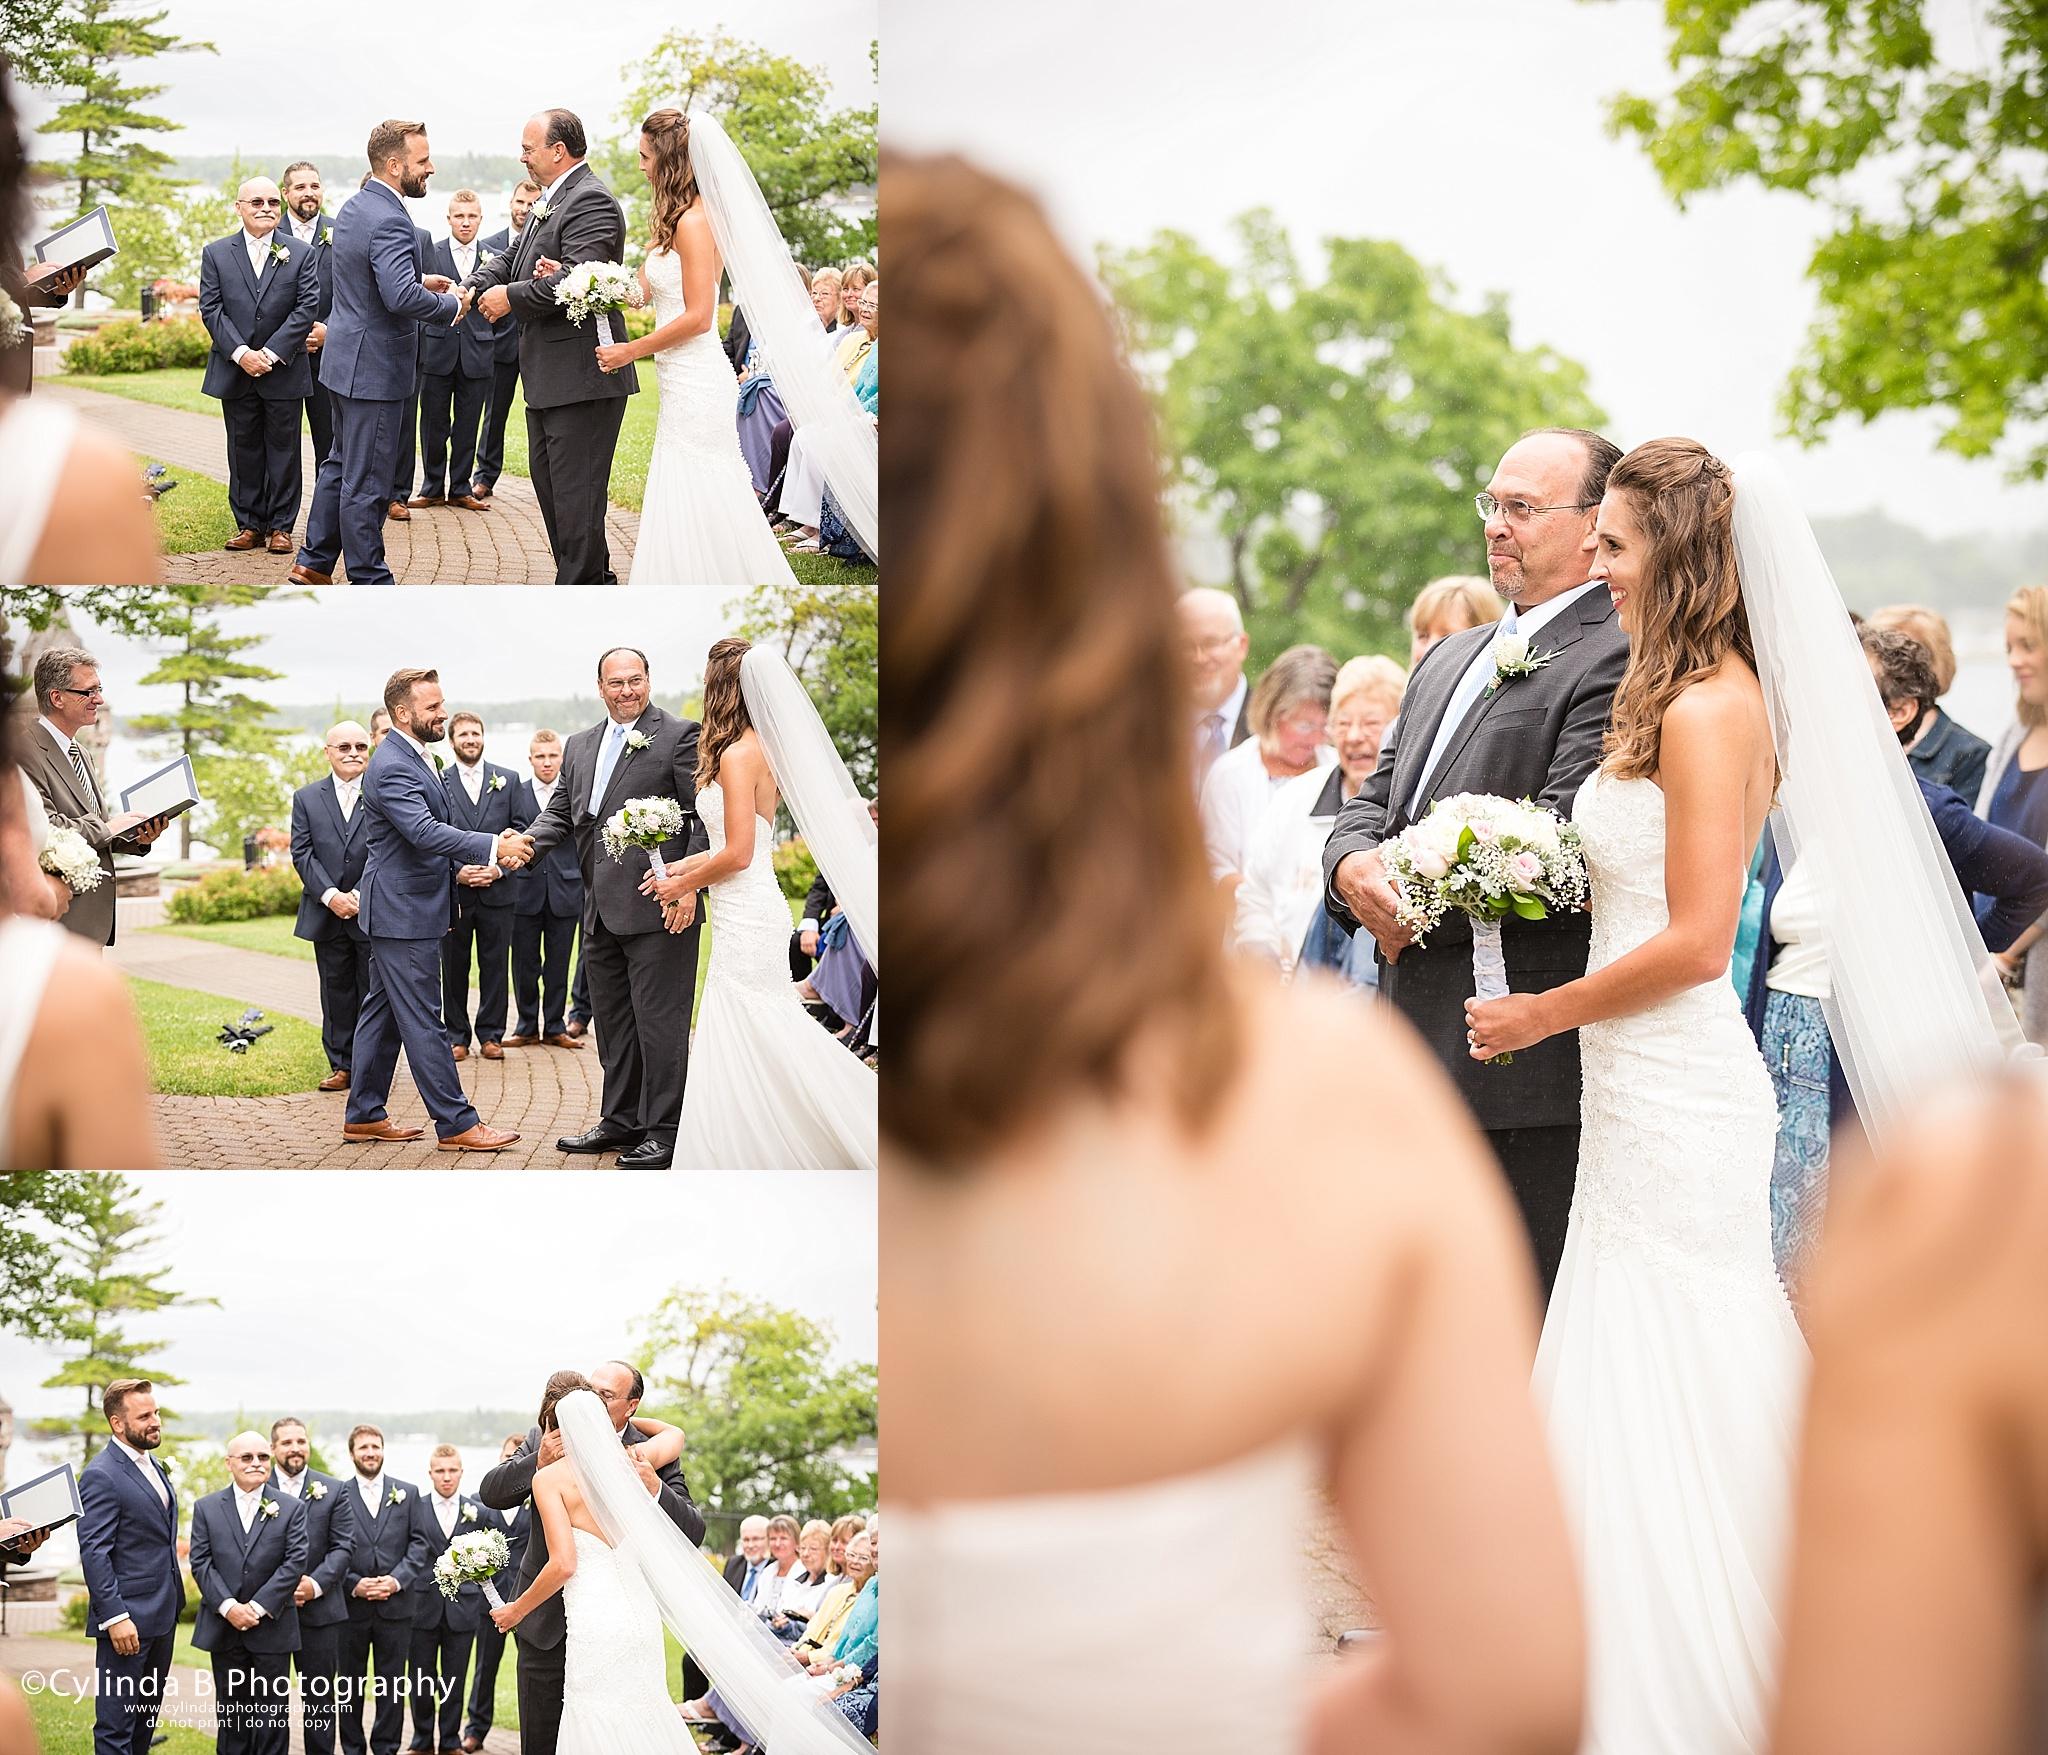 Boldt Castle Wedding, Alexandria Bay, Wedding, Photograper, Cylinda B Photography-20